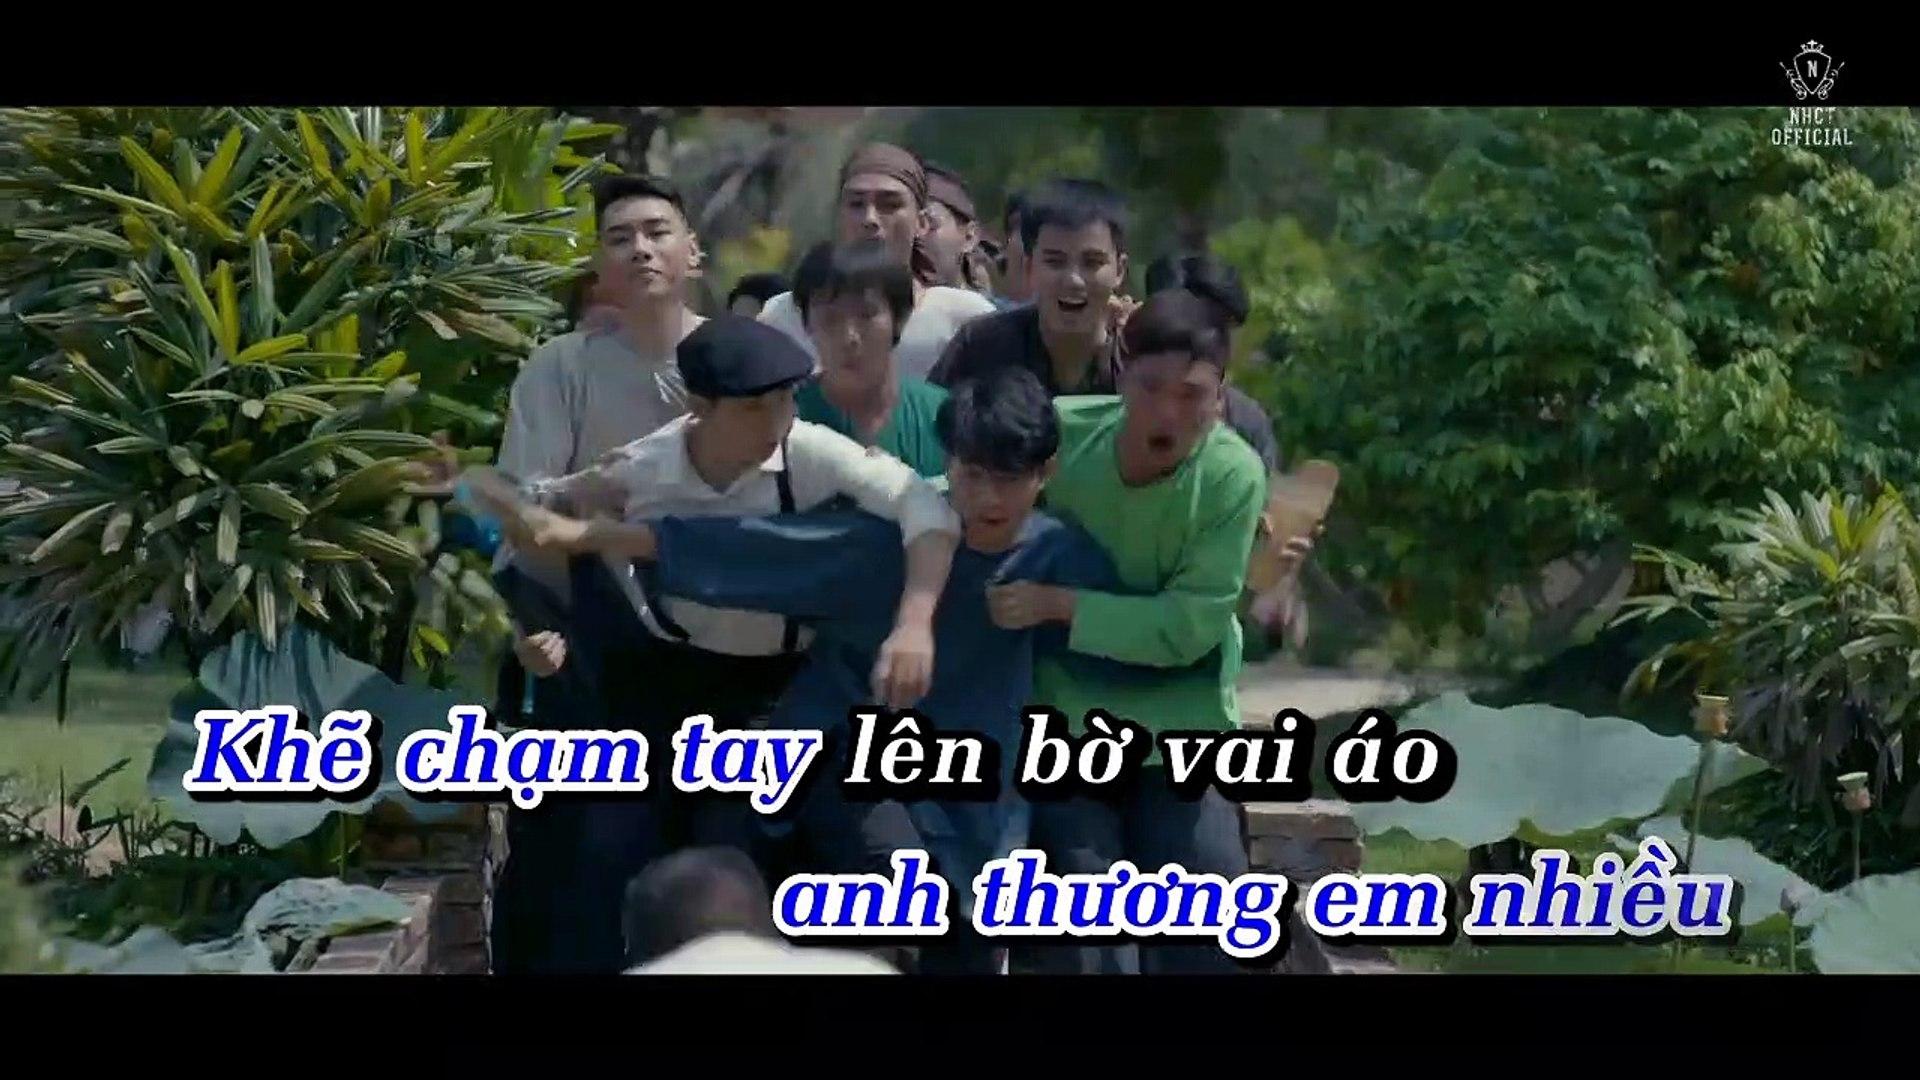 [Karaoke] Tỏ Tình - Jang Nguyễn Ft. K-ICM [Beat]